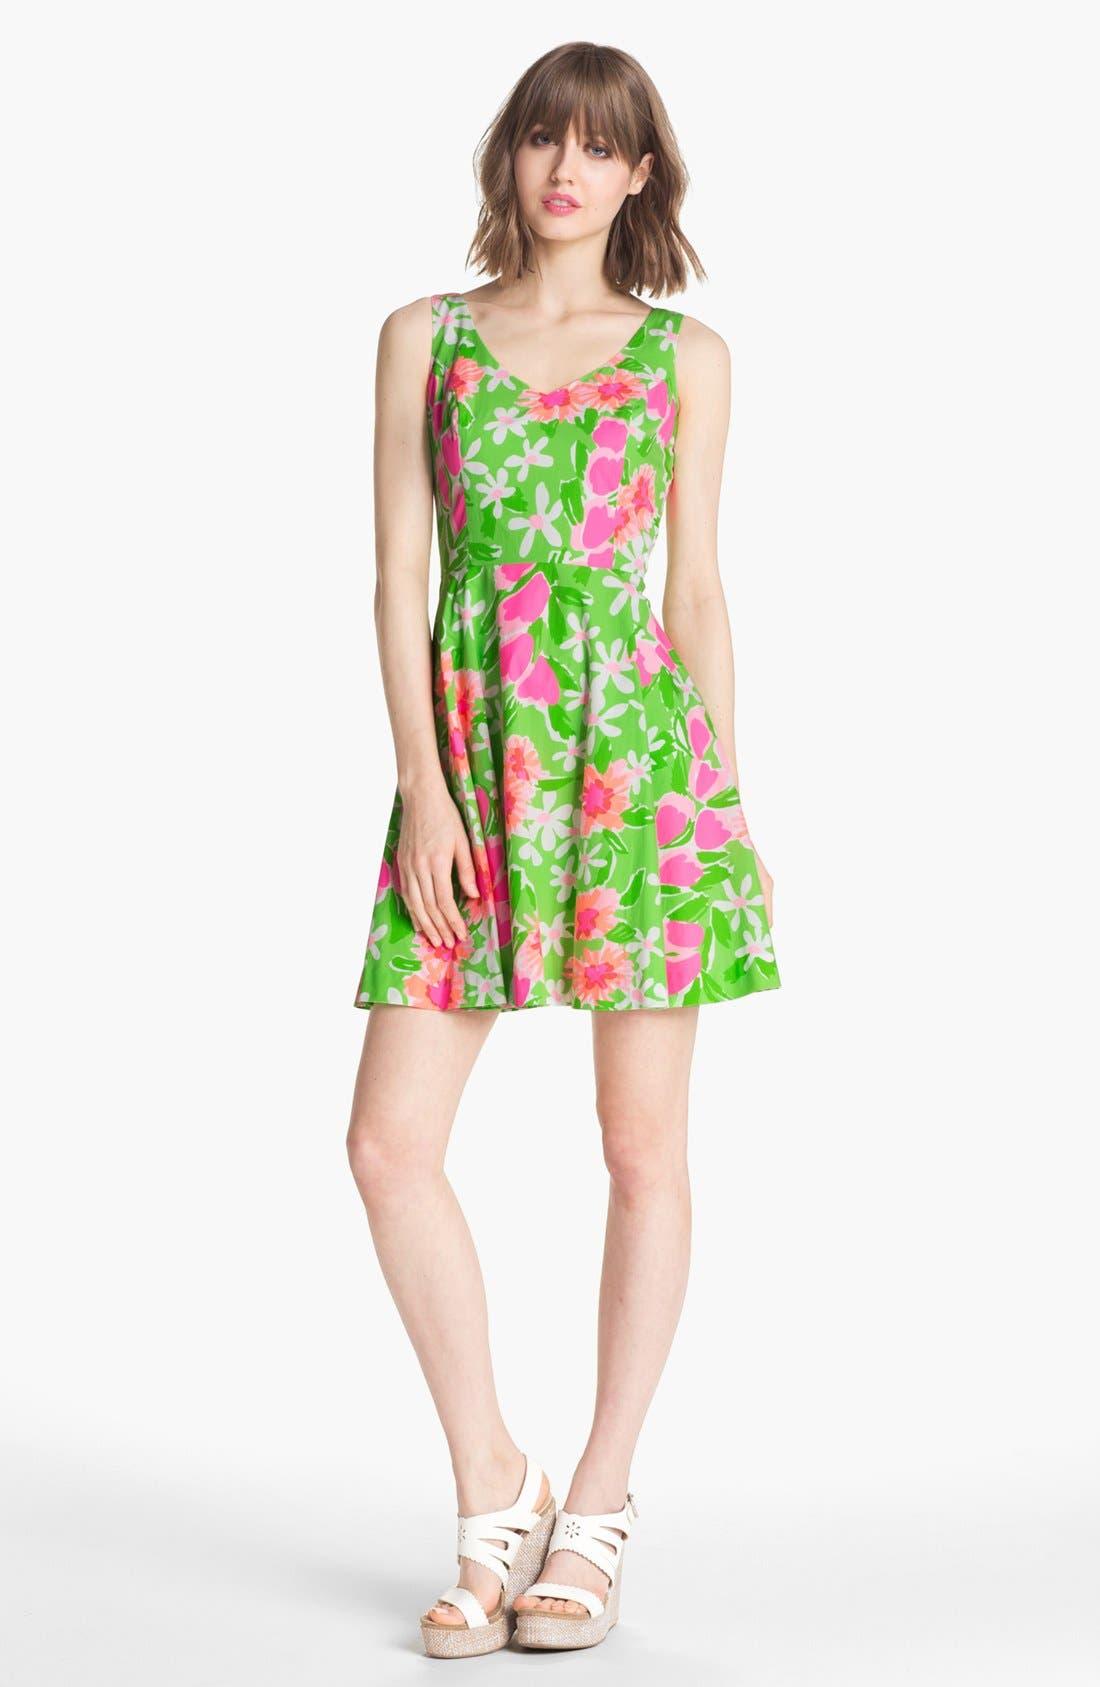 Main Image - Lilly Pulitzer® 'Freja' Print Fit & Flare Dress